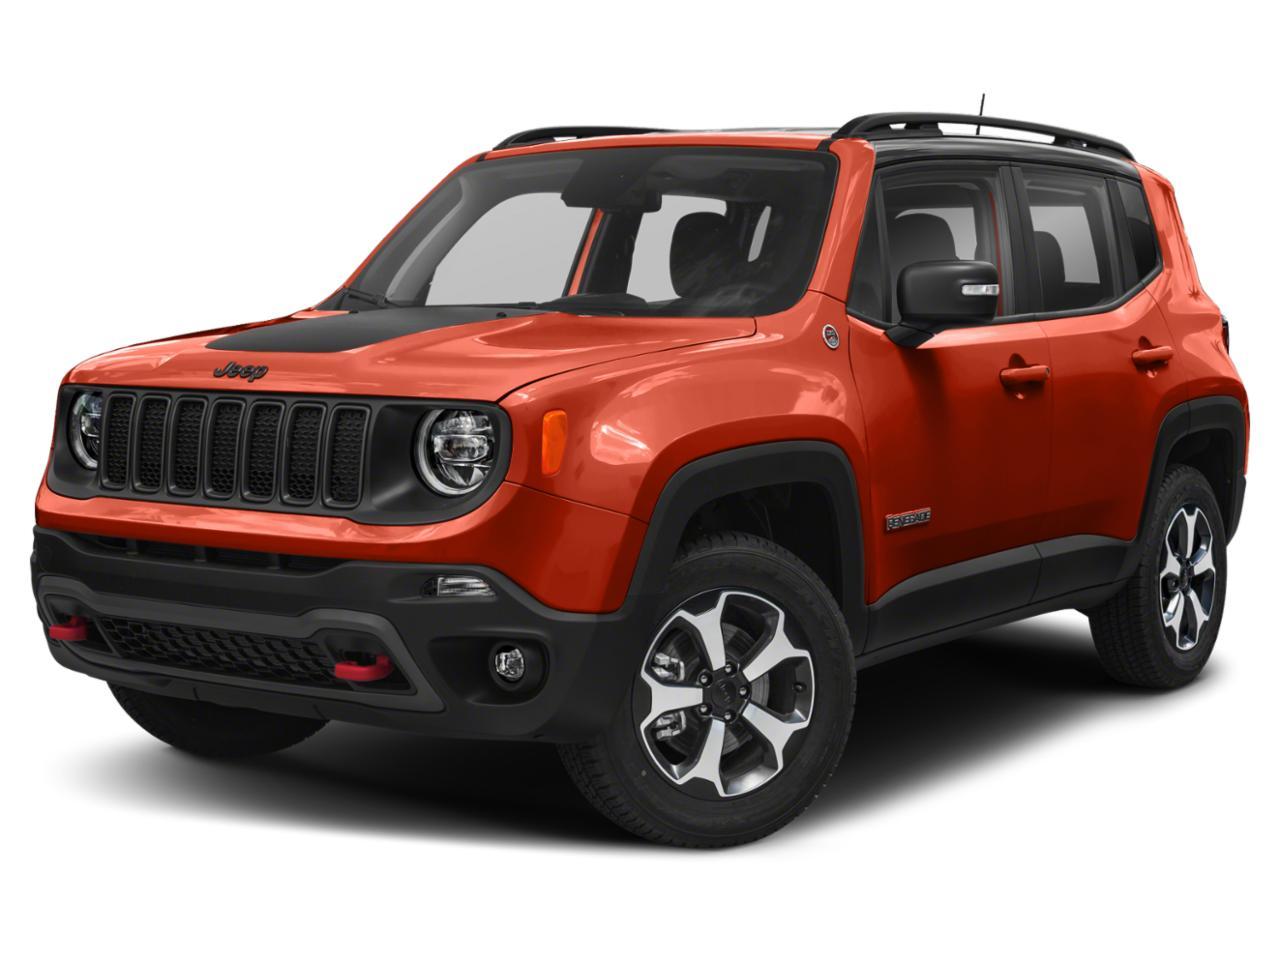 2021 Jeep Renegade Vehicle Photo in Oshkosh, WI 54901